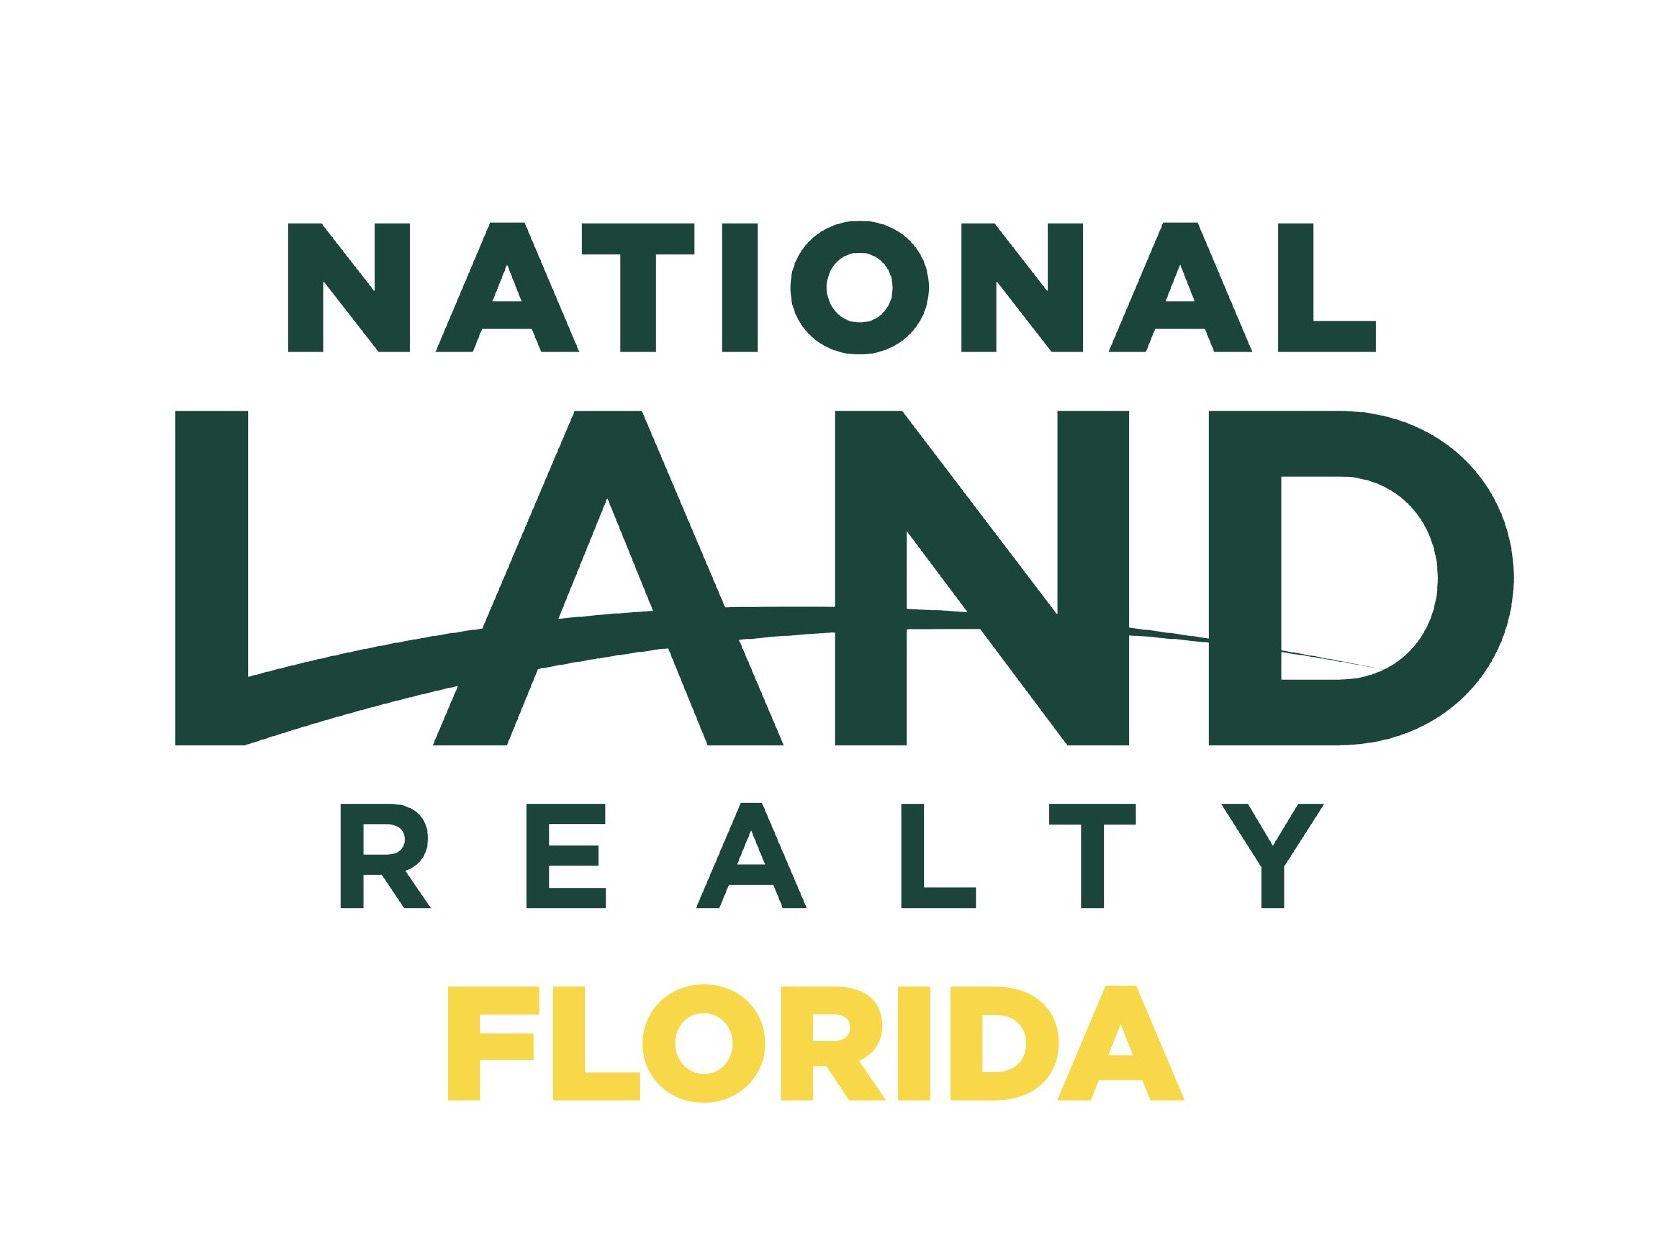 National Land Realty - Florida